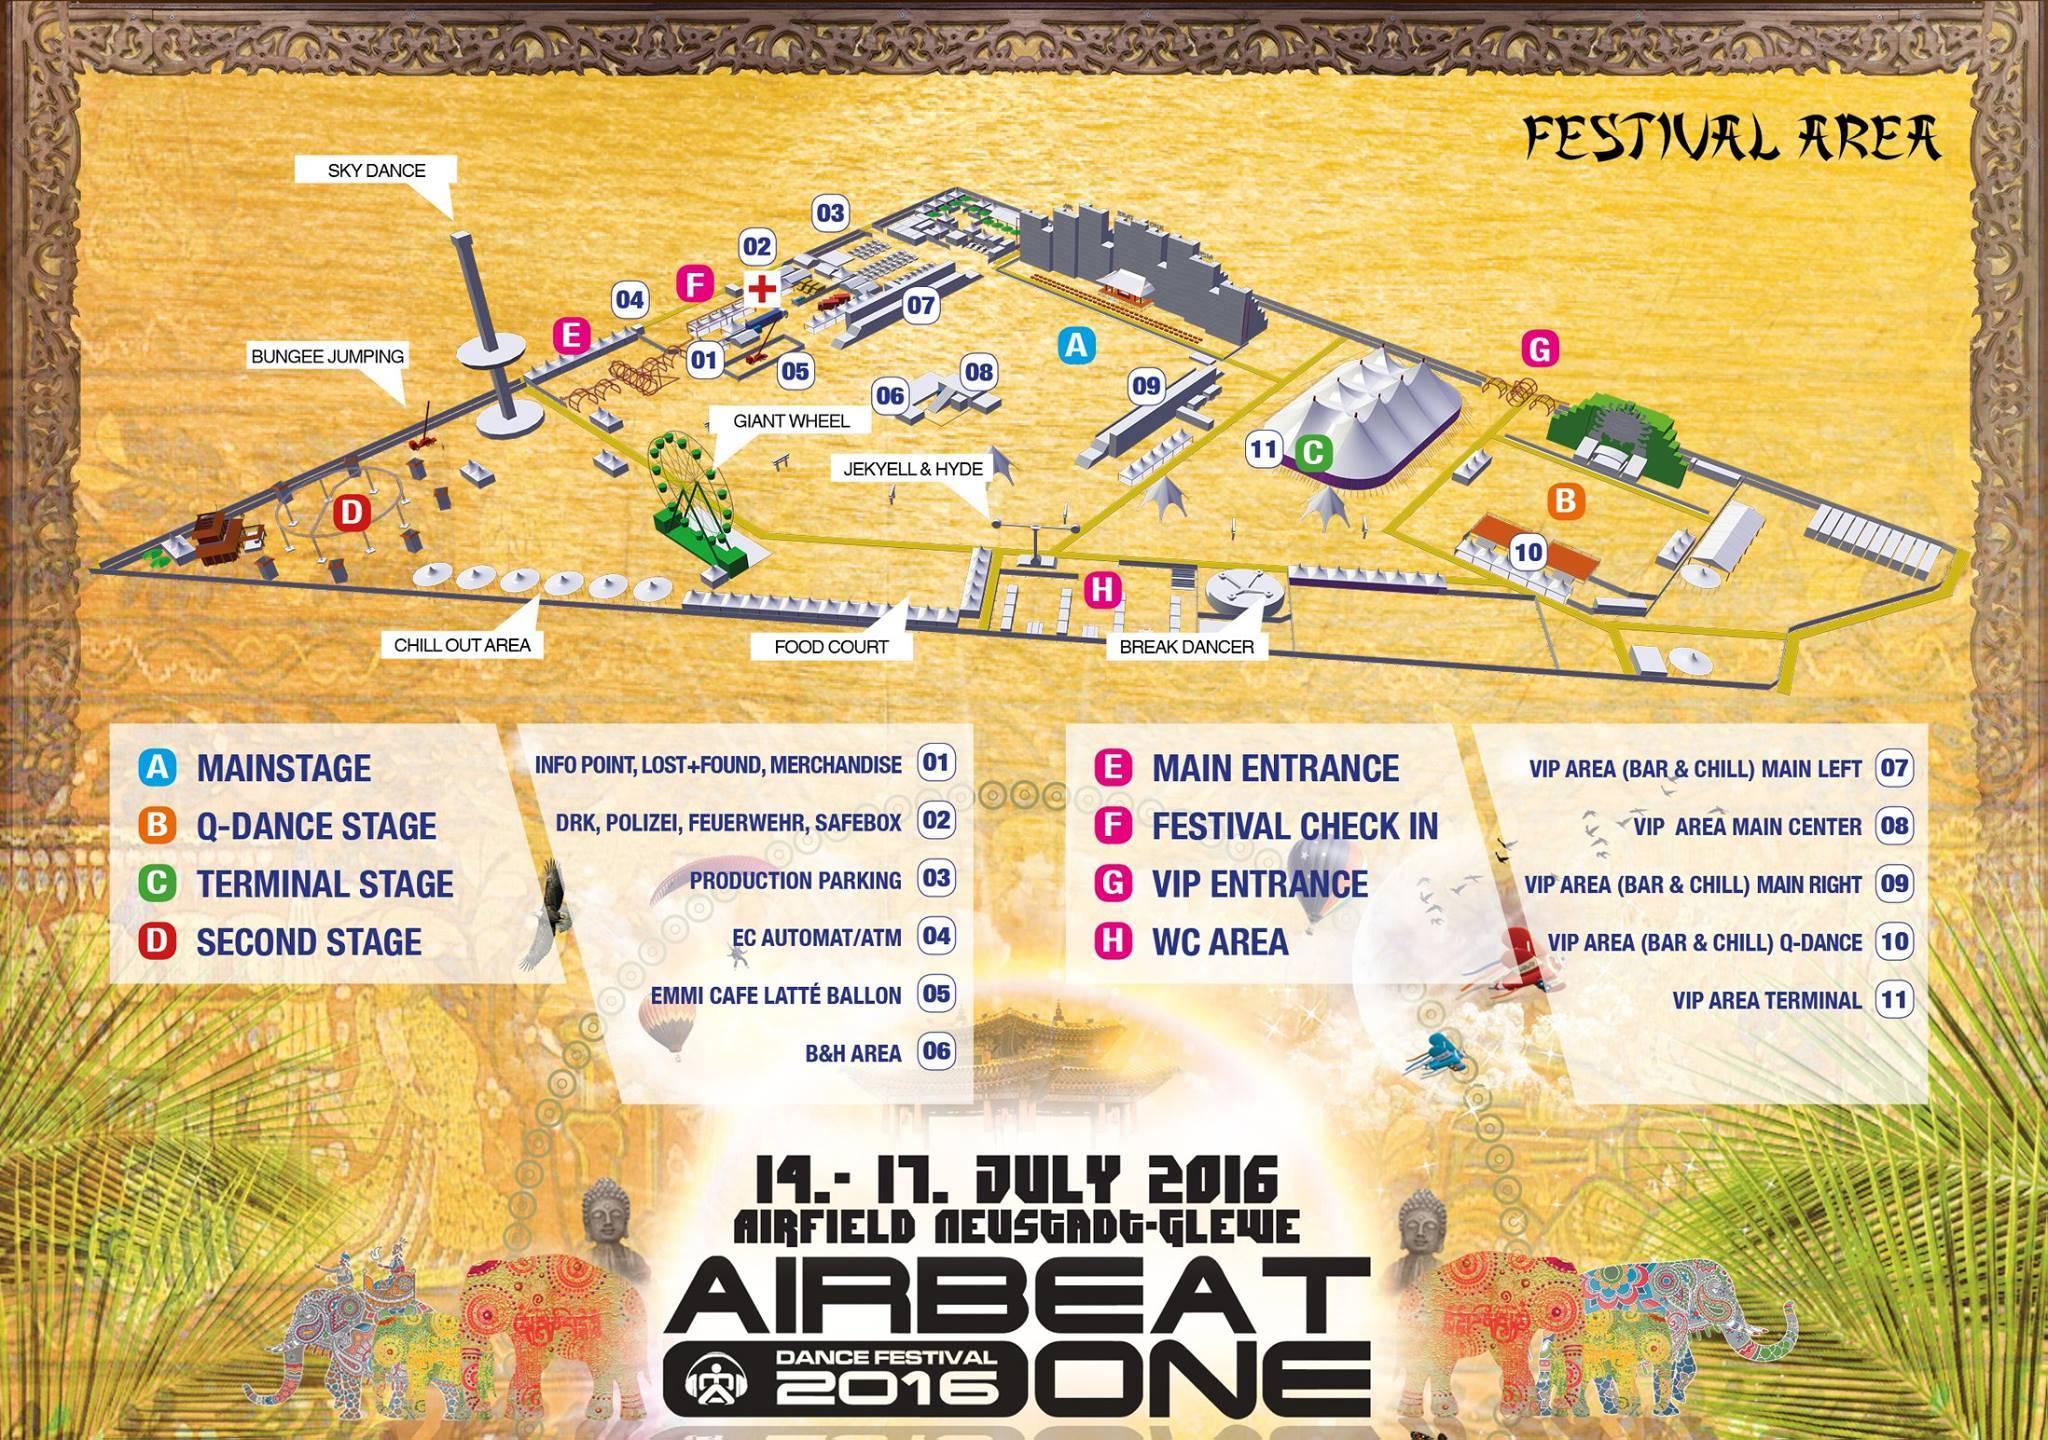 Airbeat One 2016 Lageplan